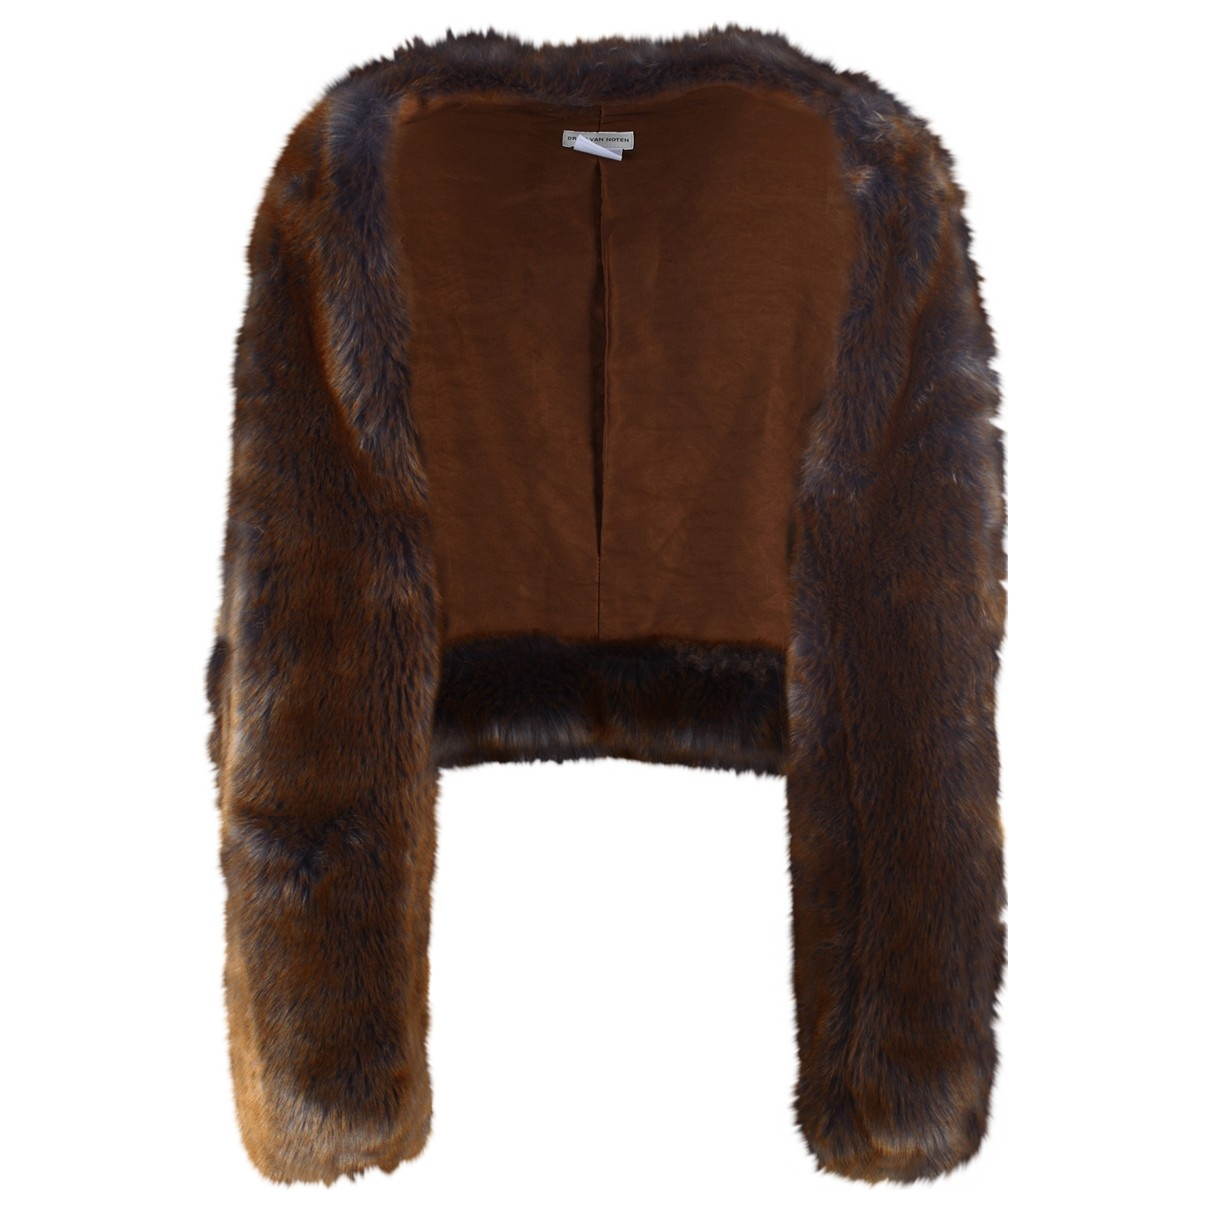 Dries Van Noten \N Multicolour jacket for Women One Size International